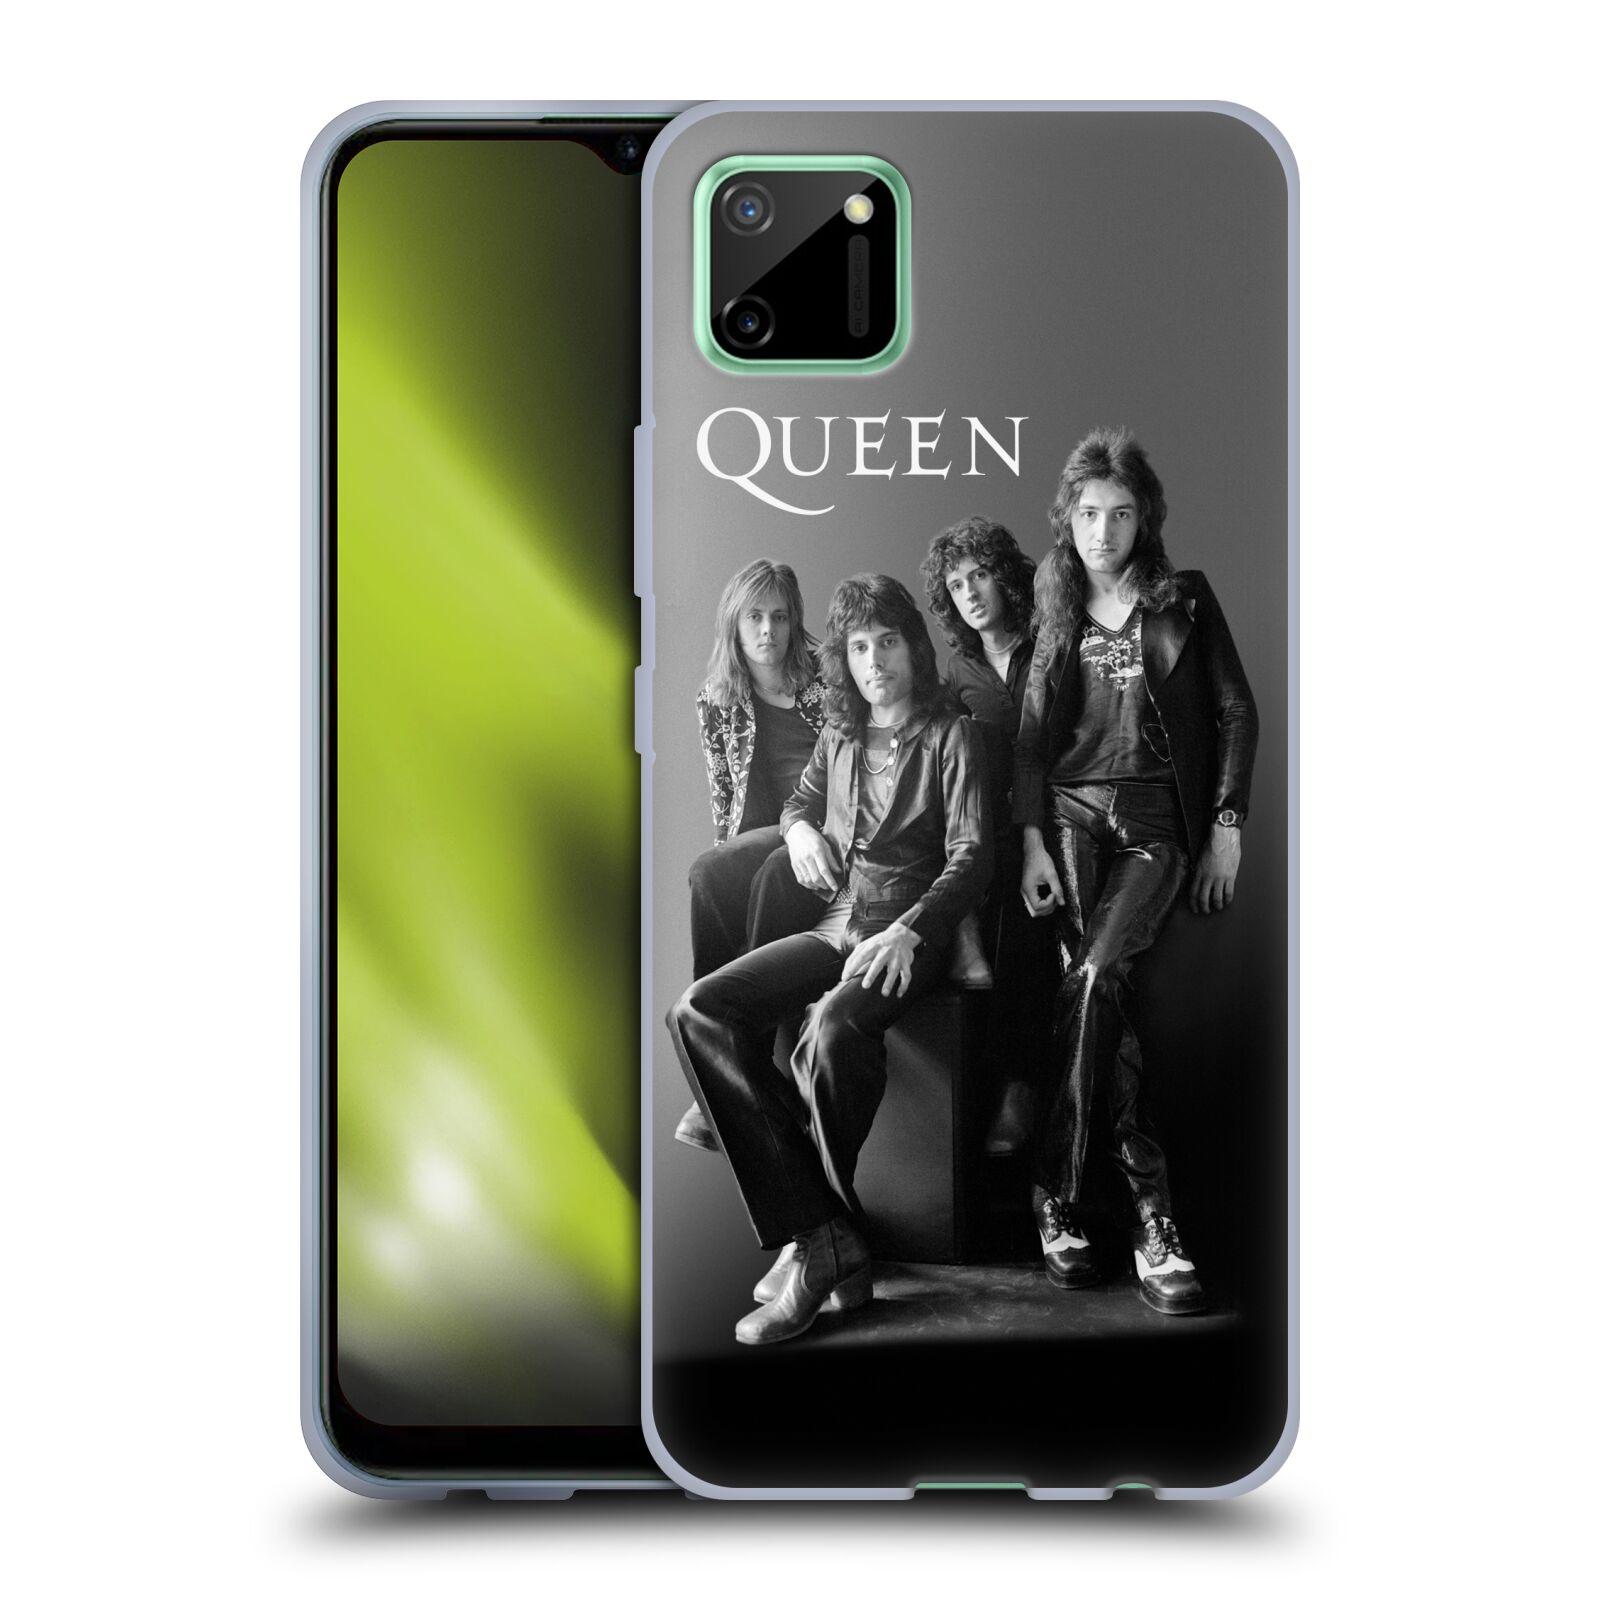 Silikonové pouzdro na mobil Realme C11 - Head Case - Queen - Skupina